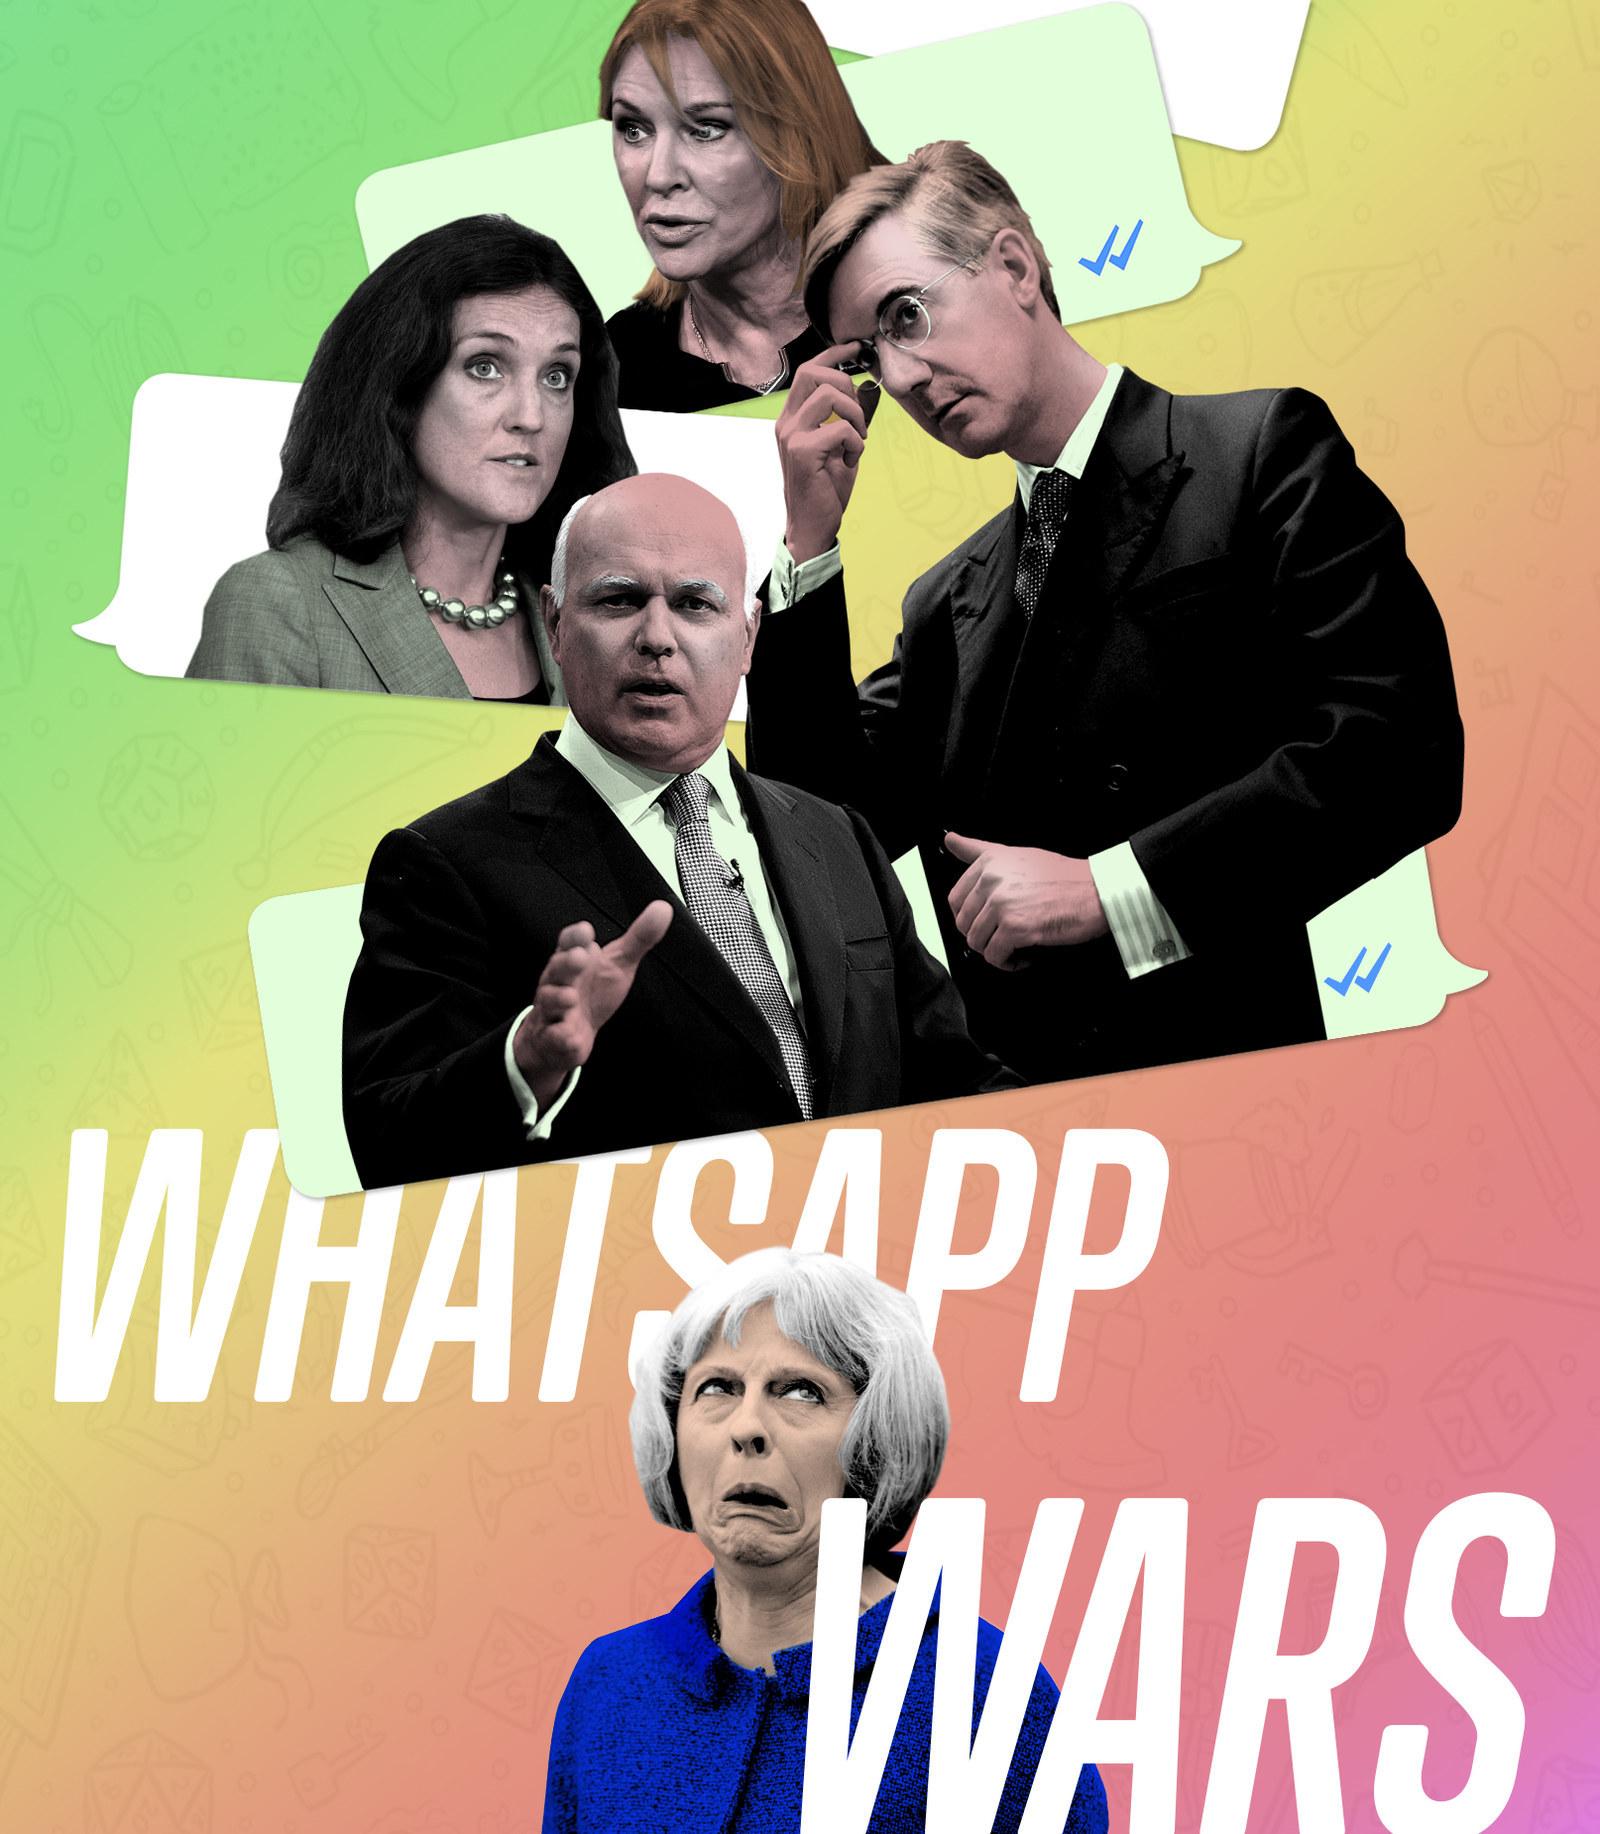 ryska dejtingsajt bilder Buzzfeed